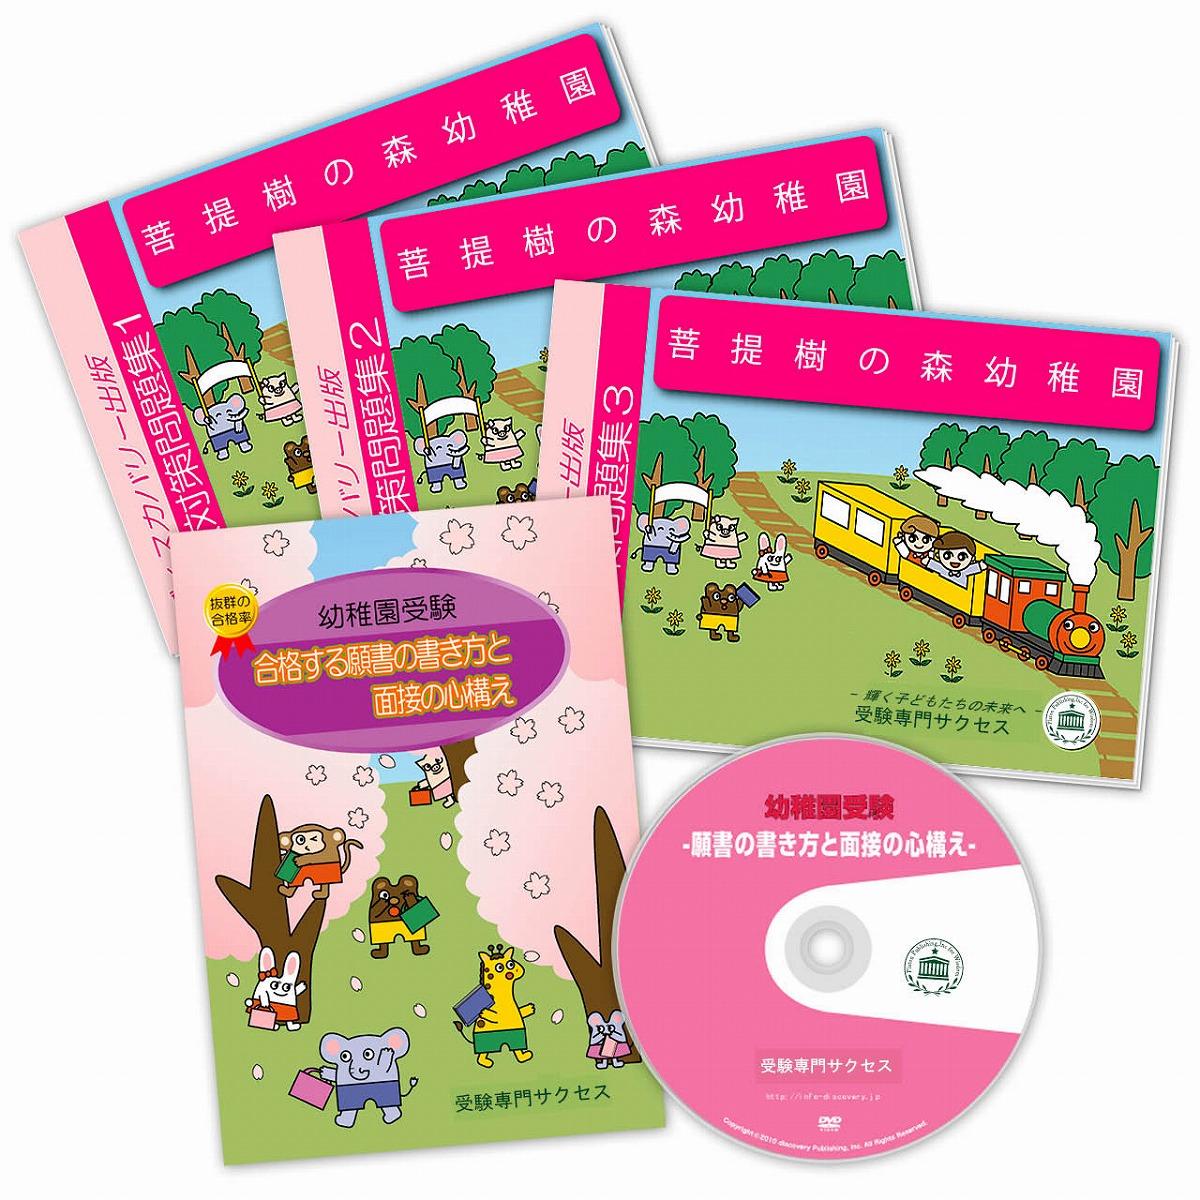 【送料・代引手数料無料】菩提樹の森幼稚園・合格セット